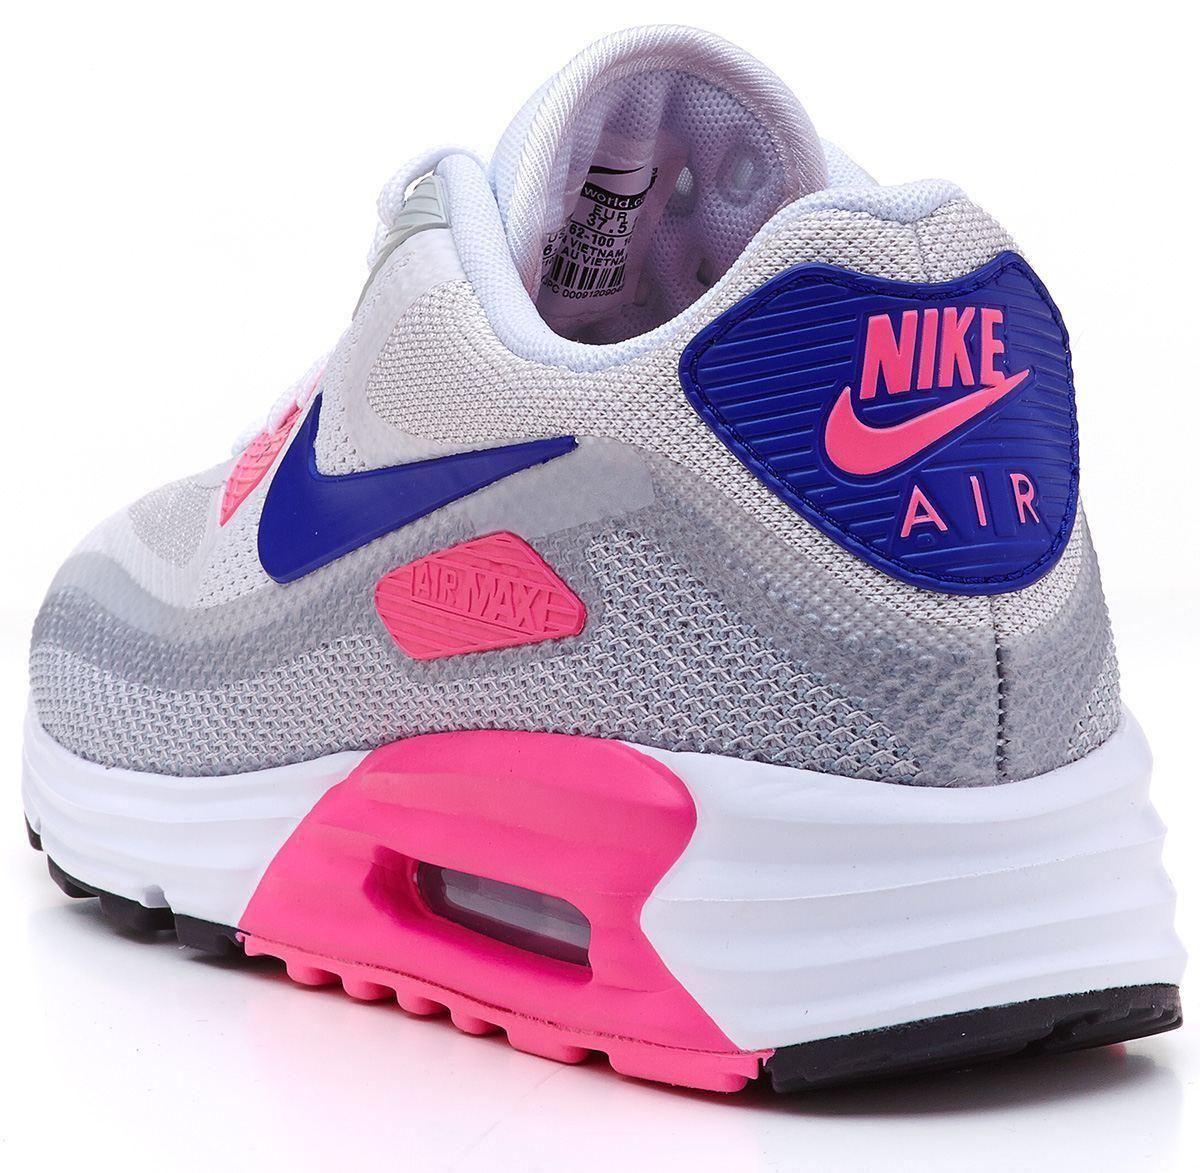 Best Womens Running Shoes Severe Overpronation